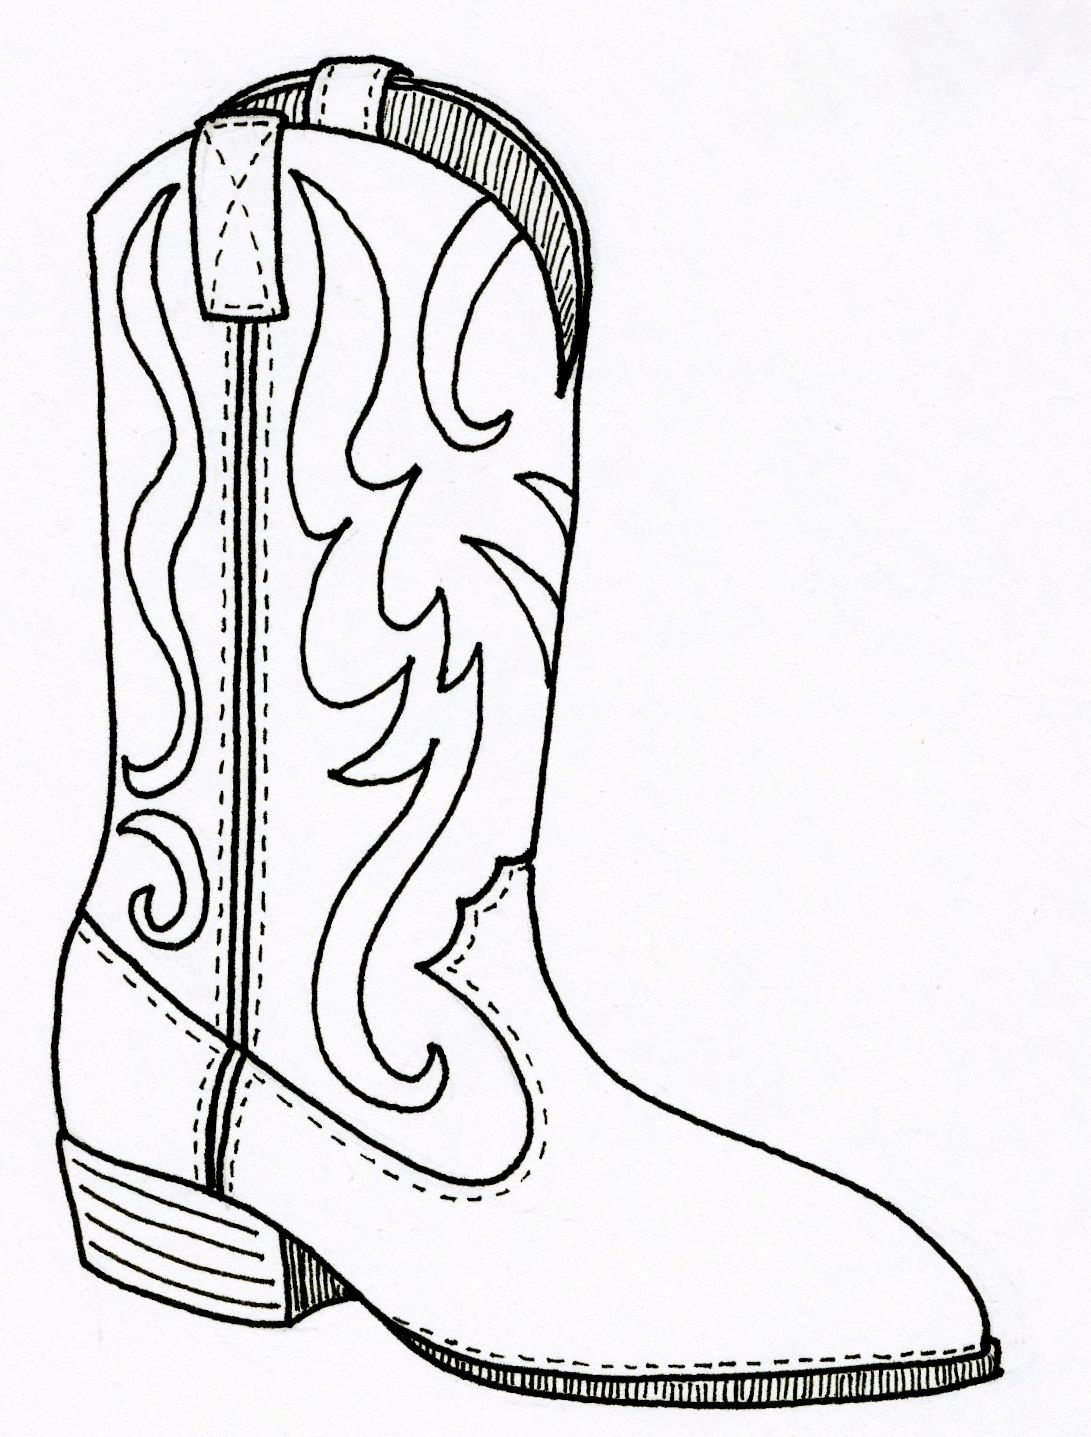 cowboy hat coloring page # 23